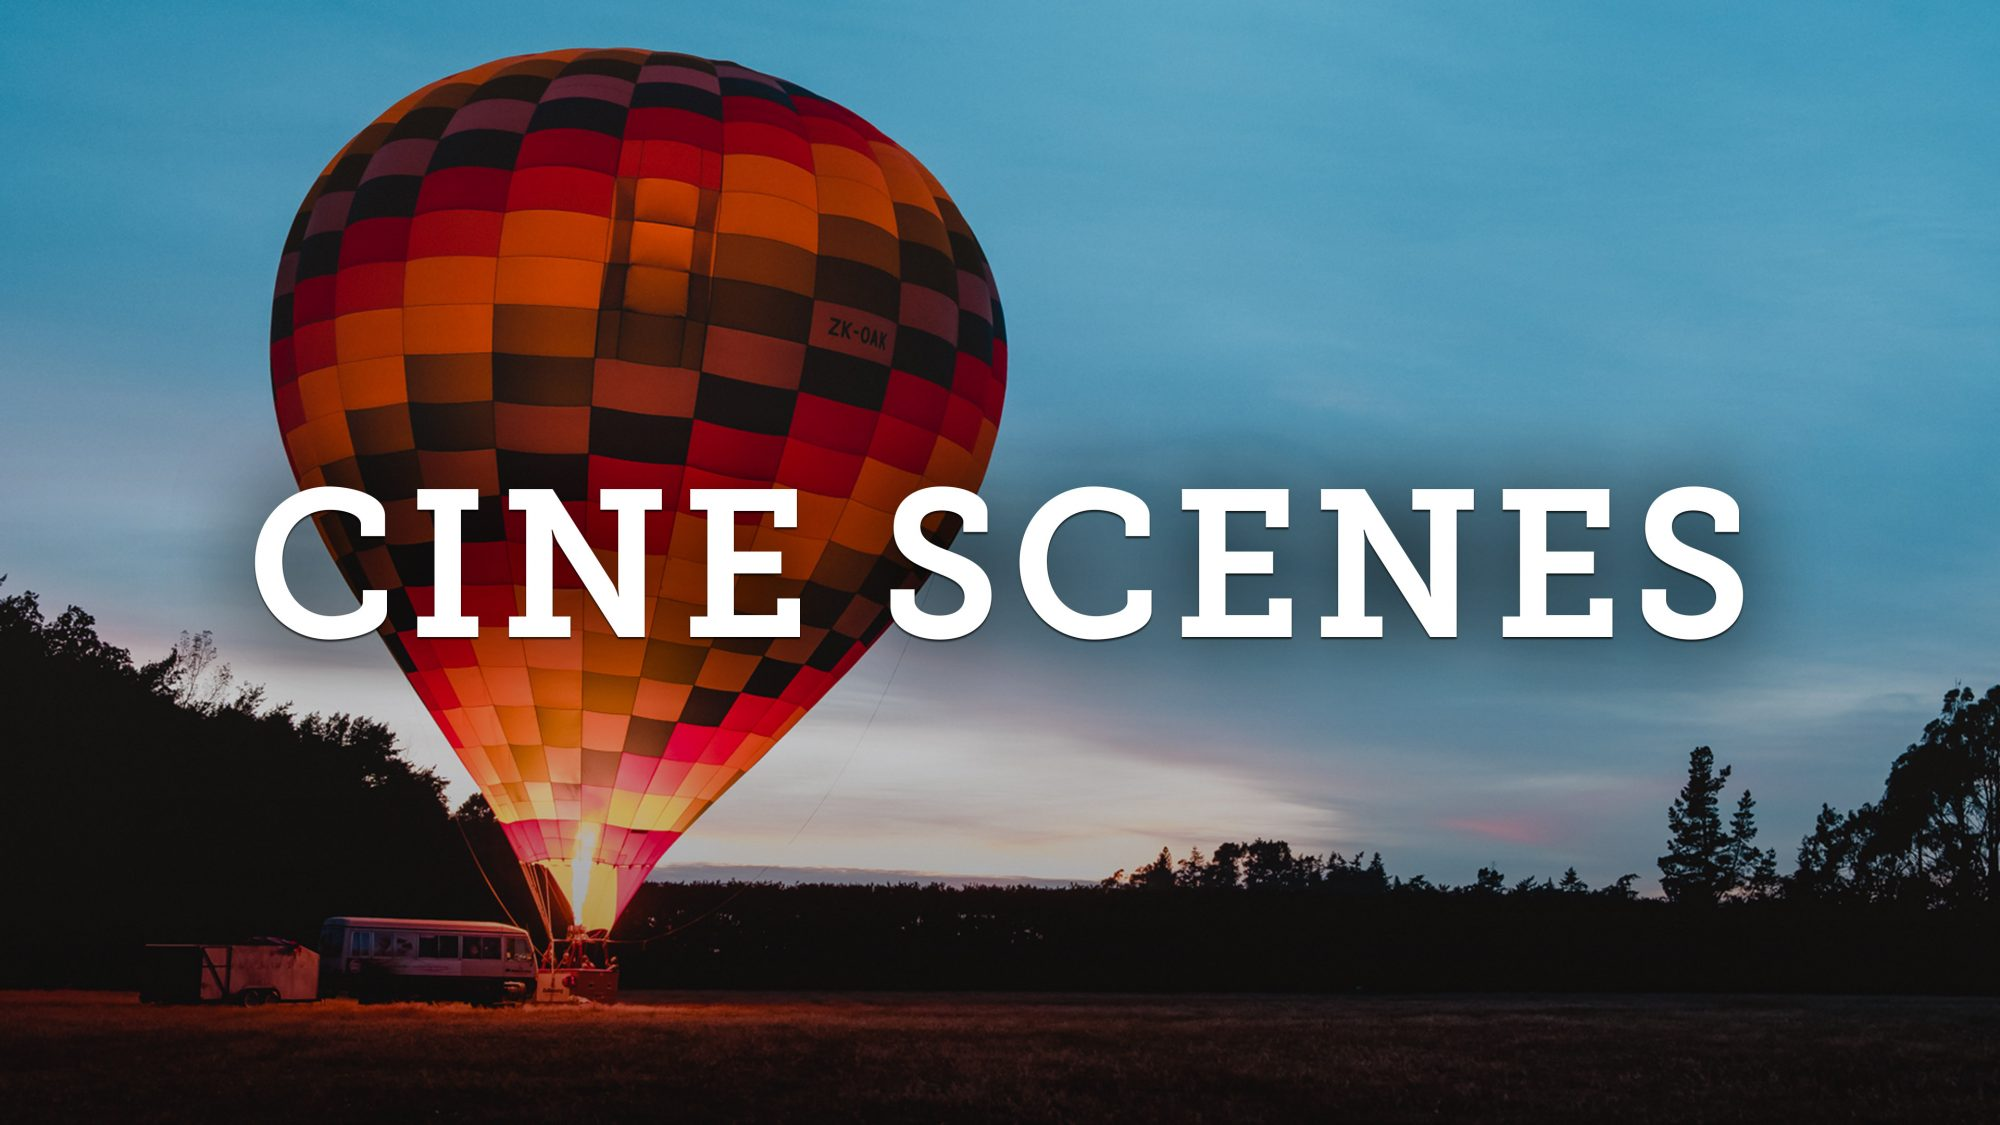 Hot Air Ballooning Cine Scenes